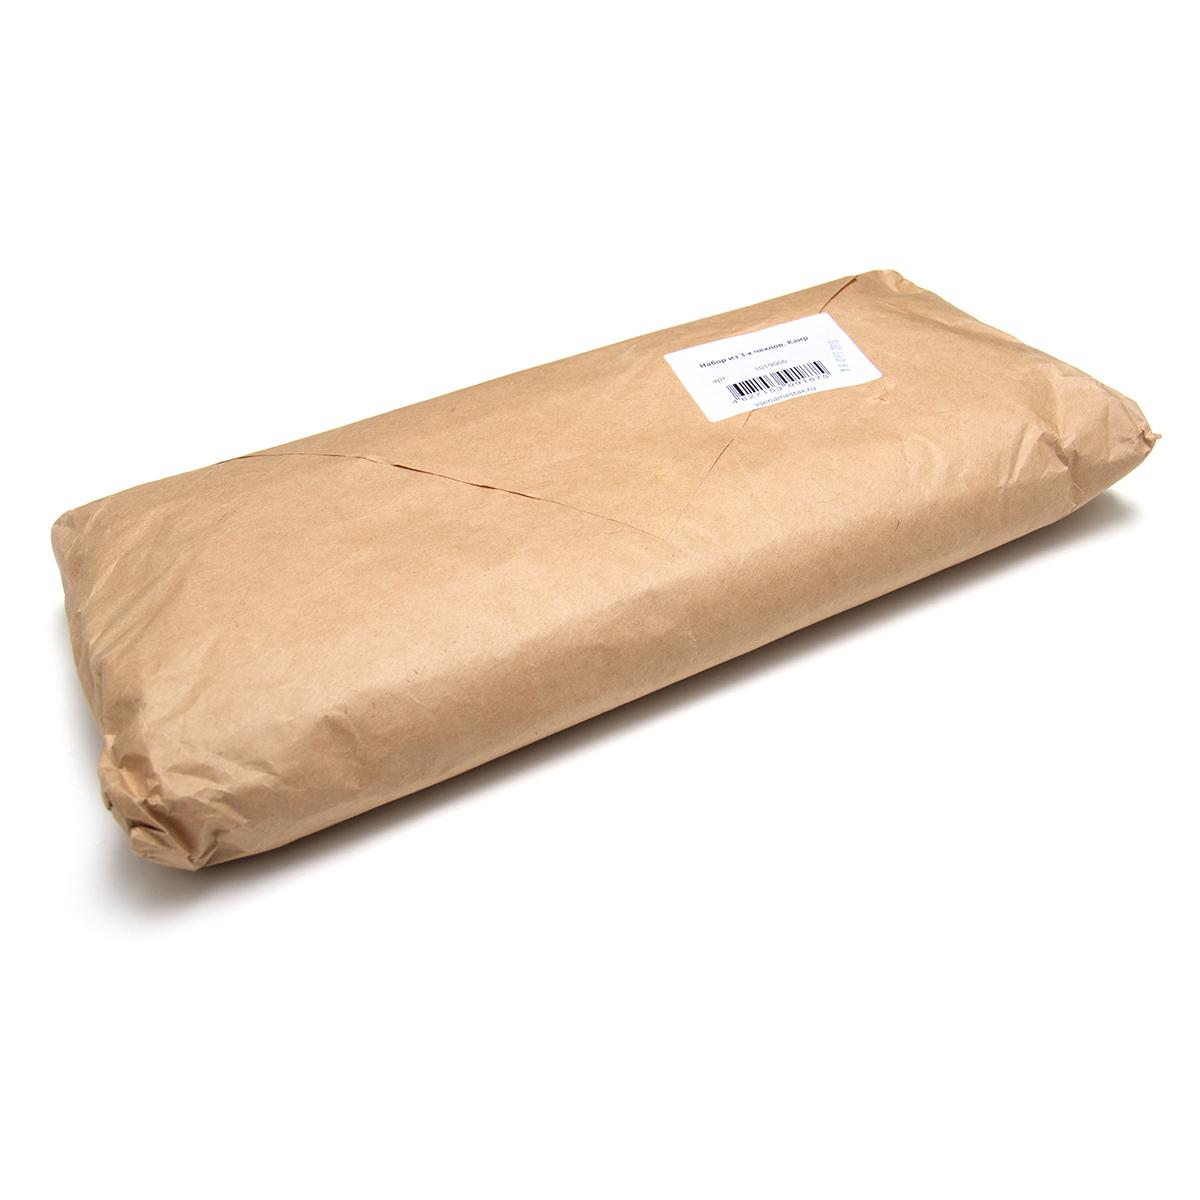 Органайзер 50х18х16 см, 2 ячейки, Каир